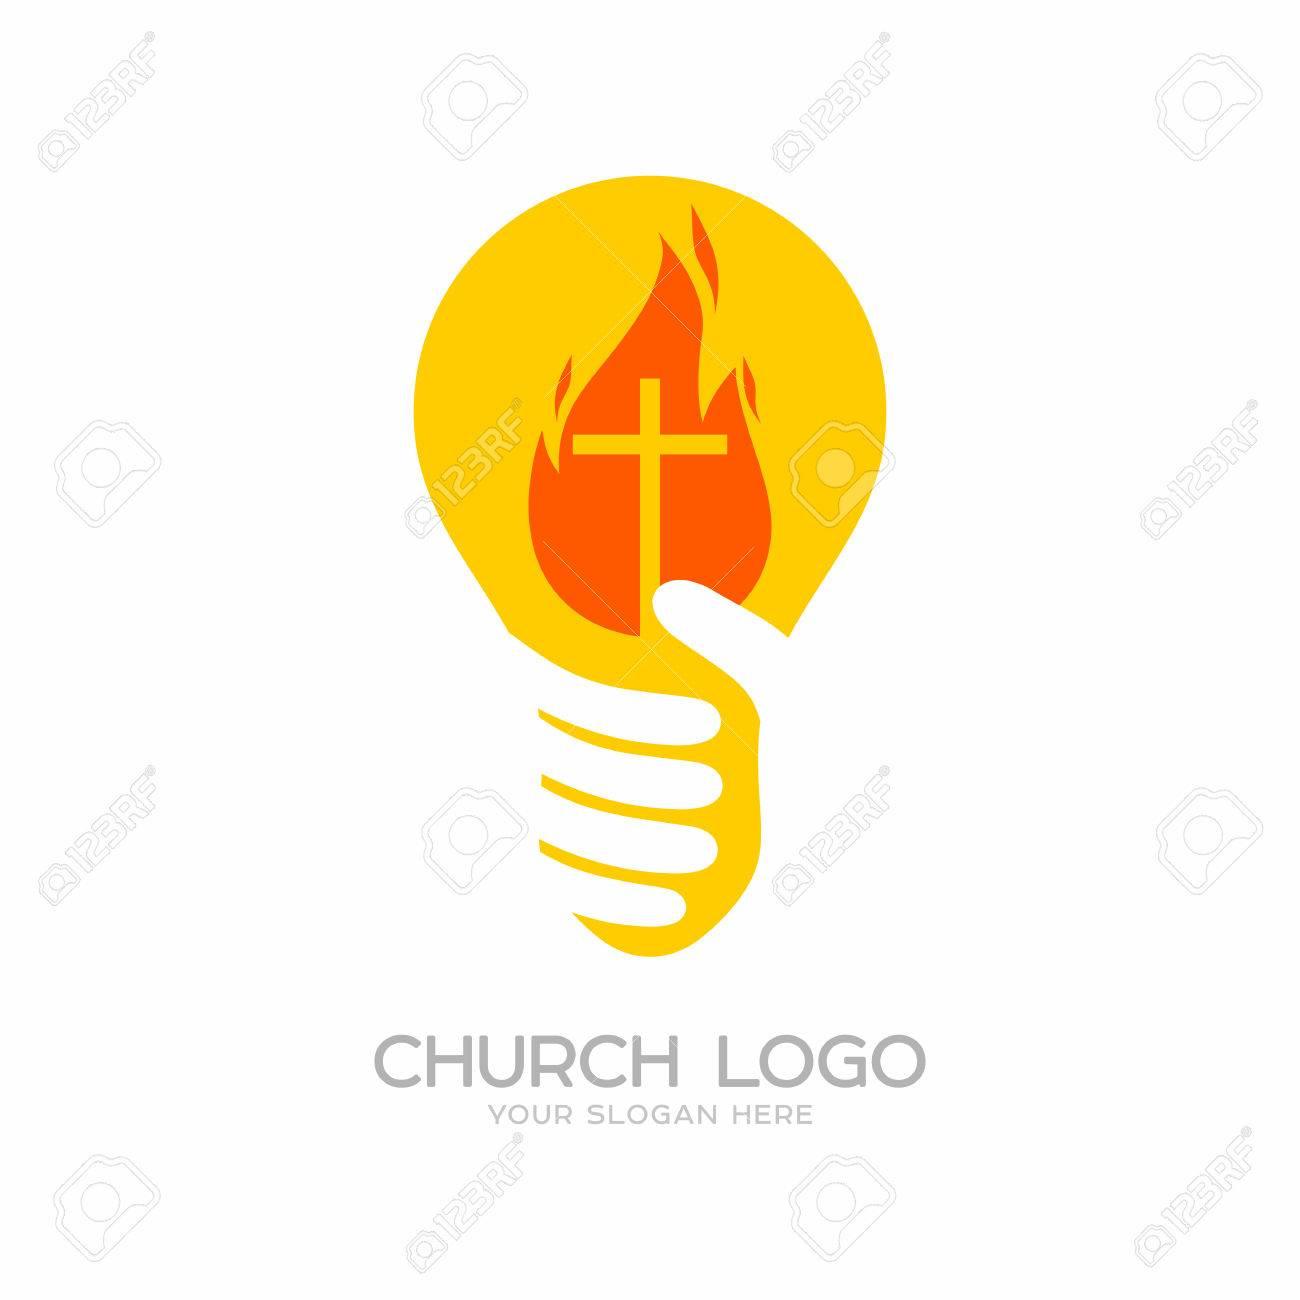 Church logo. Christian symbols. Lamp, light of the world.